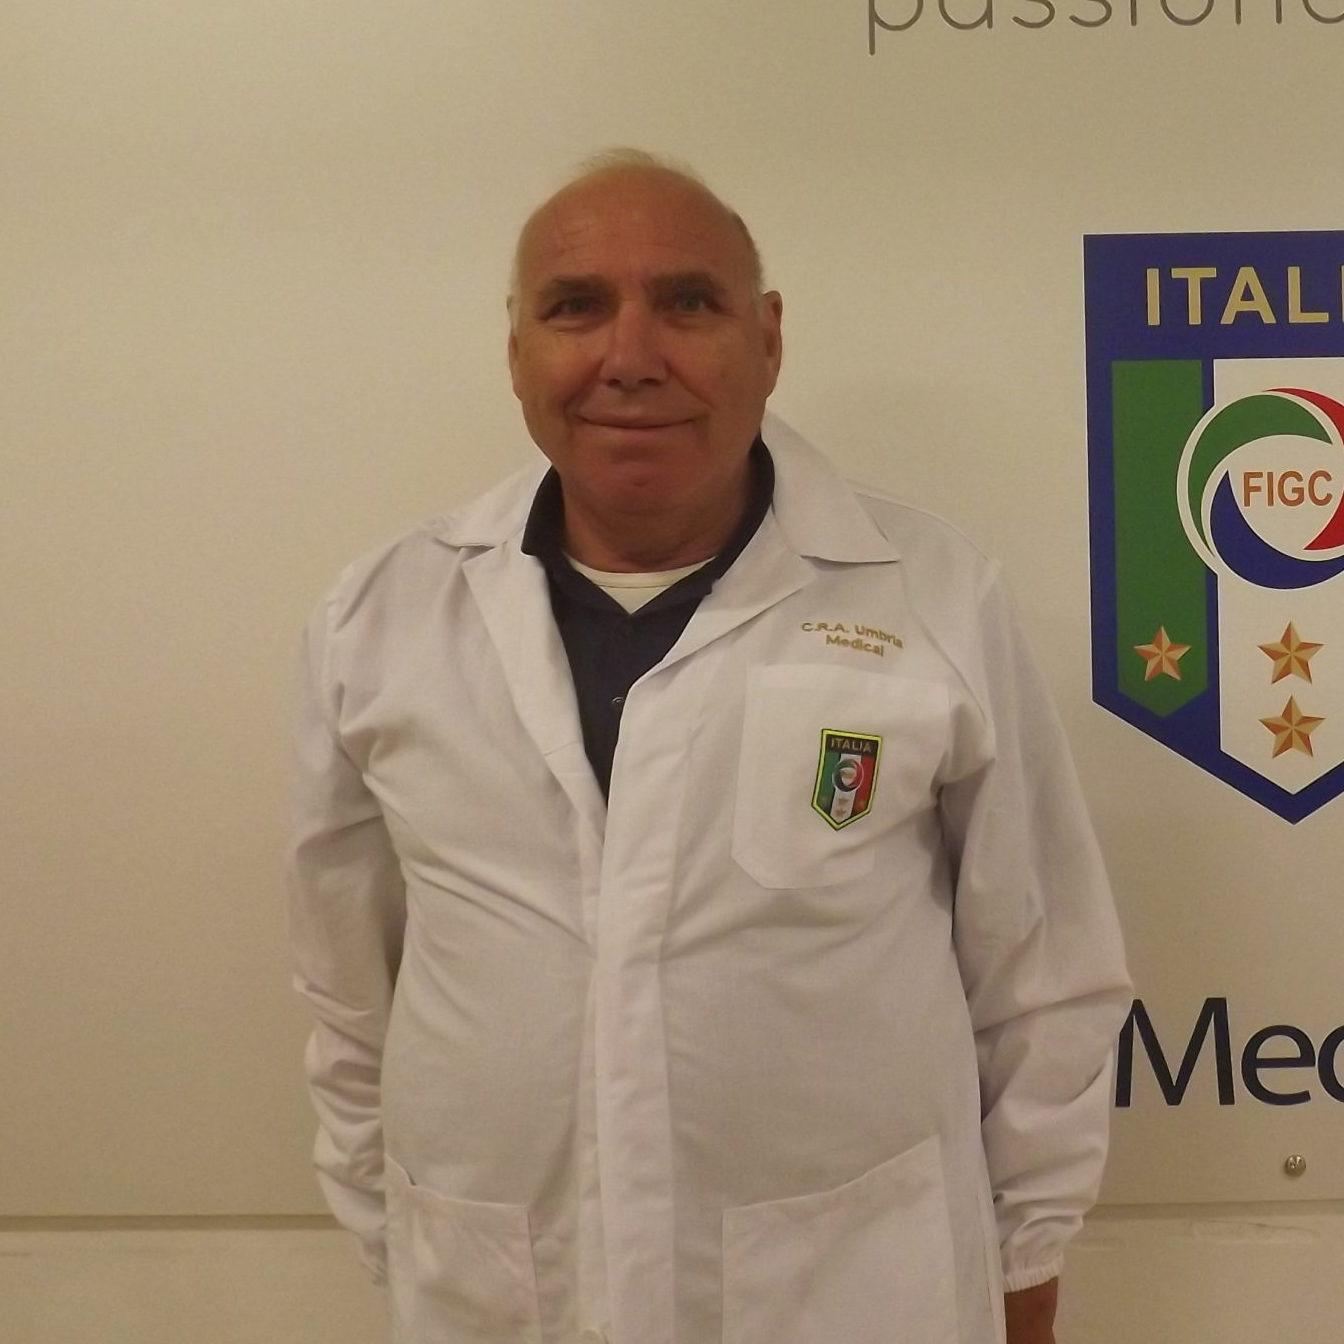 Bartoccini Ivano